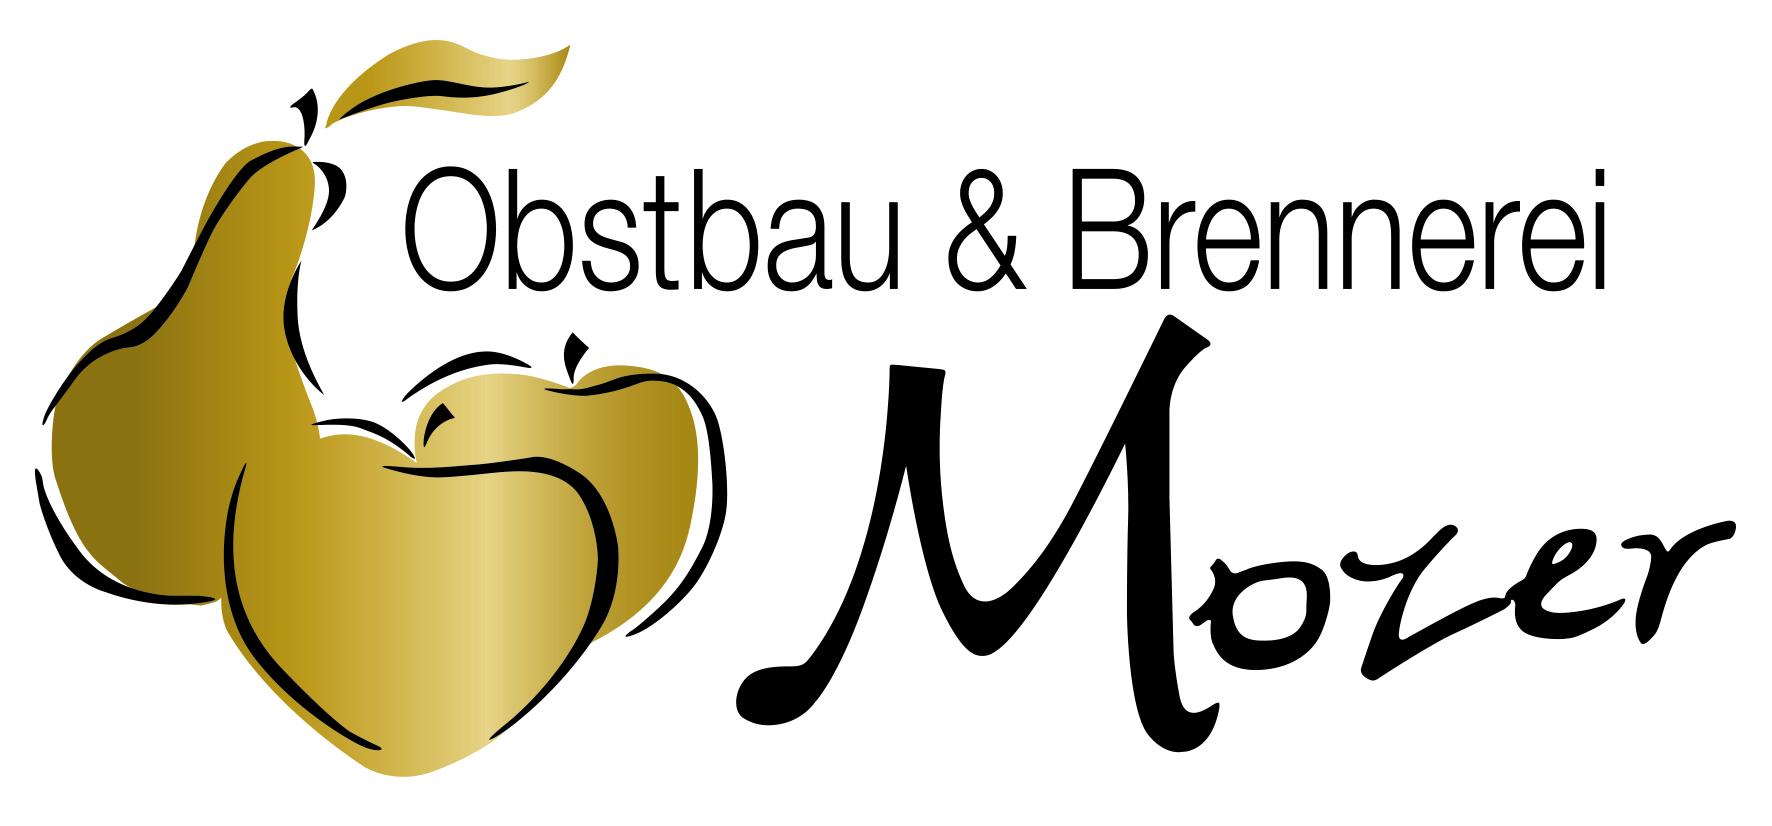 Obstbau & Brennerei Mozer